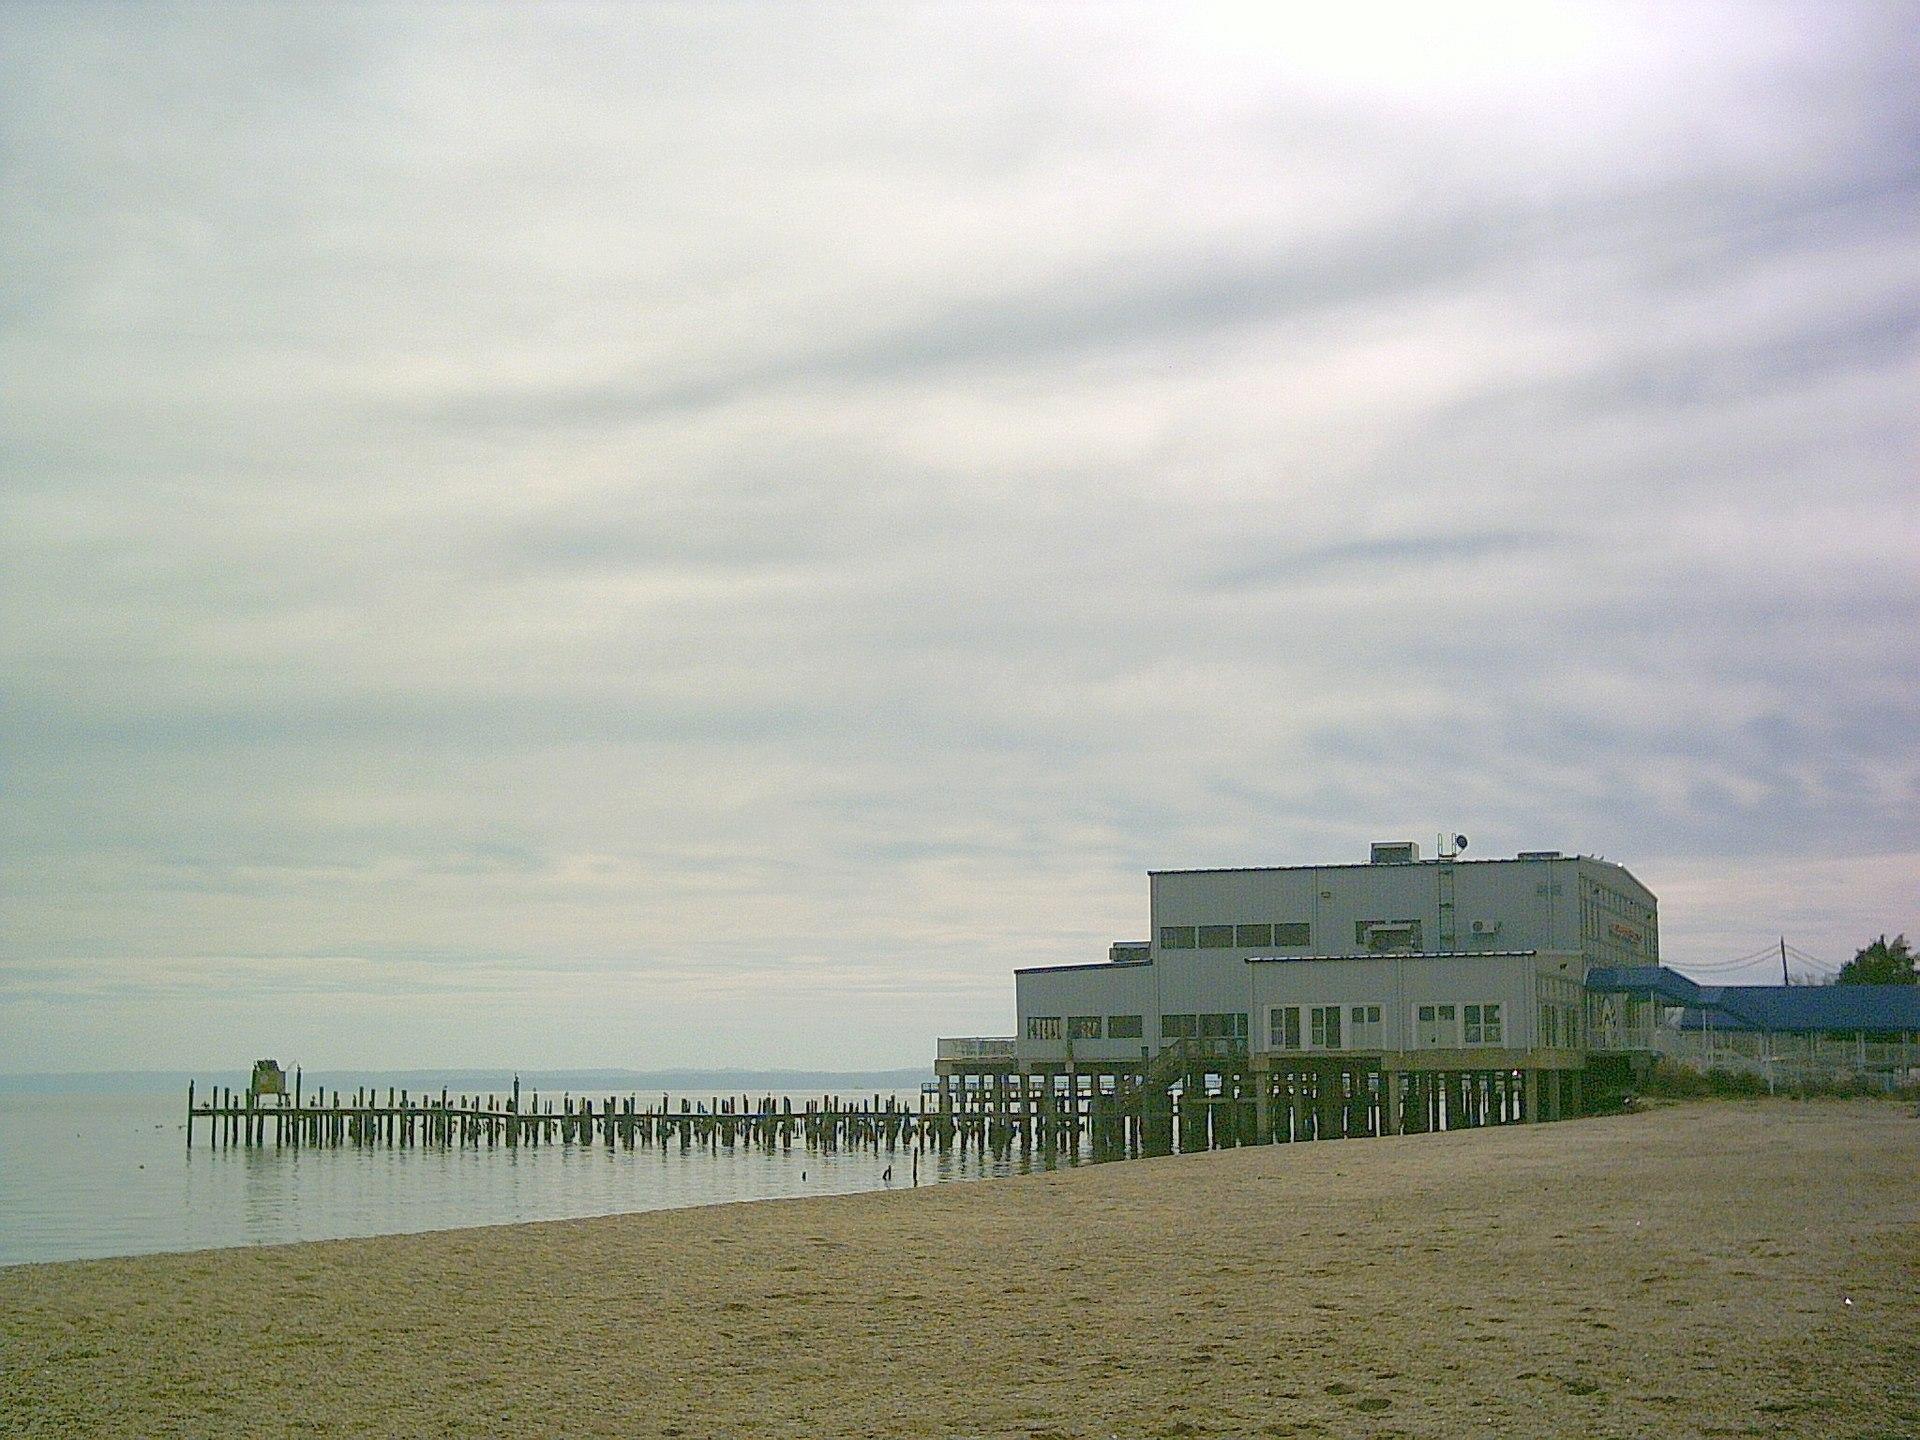 Colonial Beach Virginia  Wikipedia